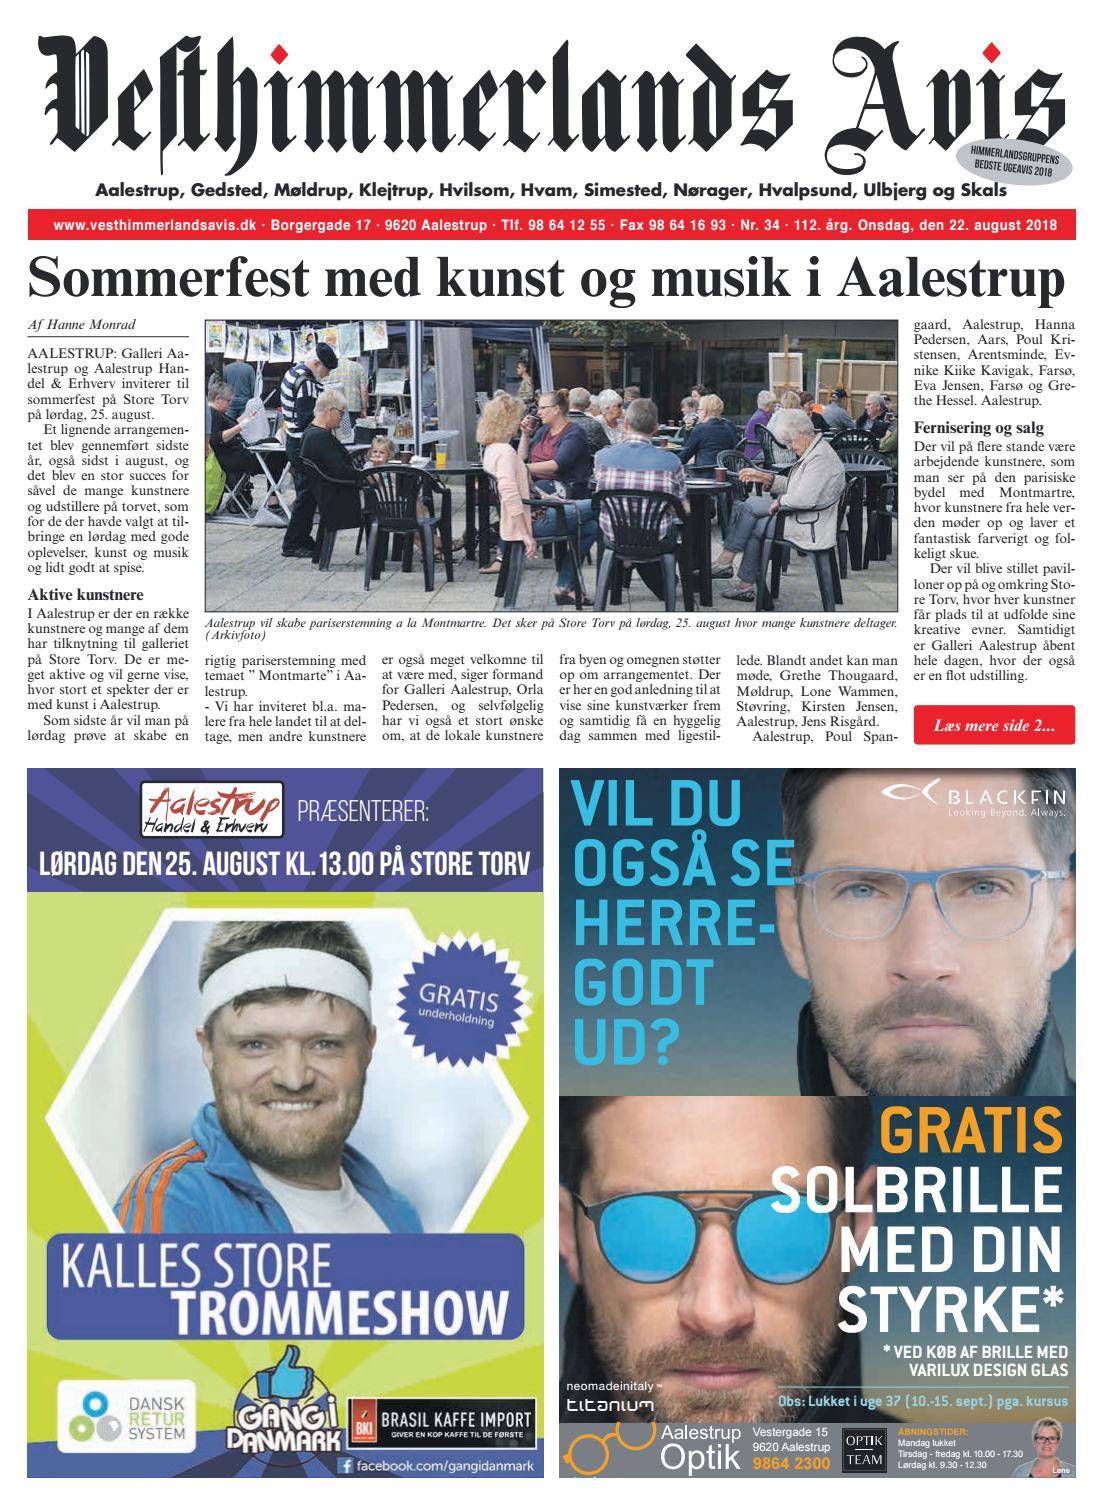 67fff973d24d Vesthimmerlands Avis nr. 34 - 2018 by Vesthimmerlands Avis - issuu